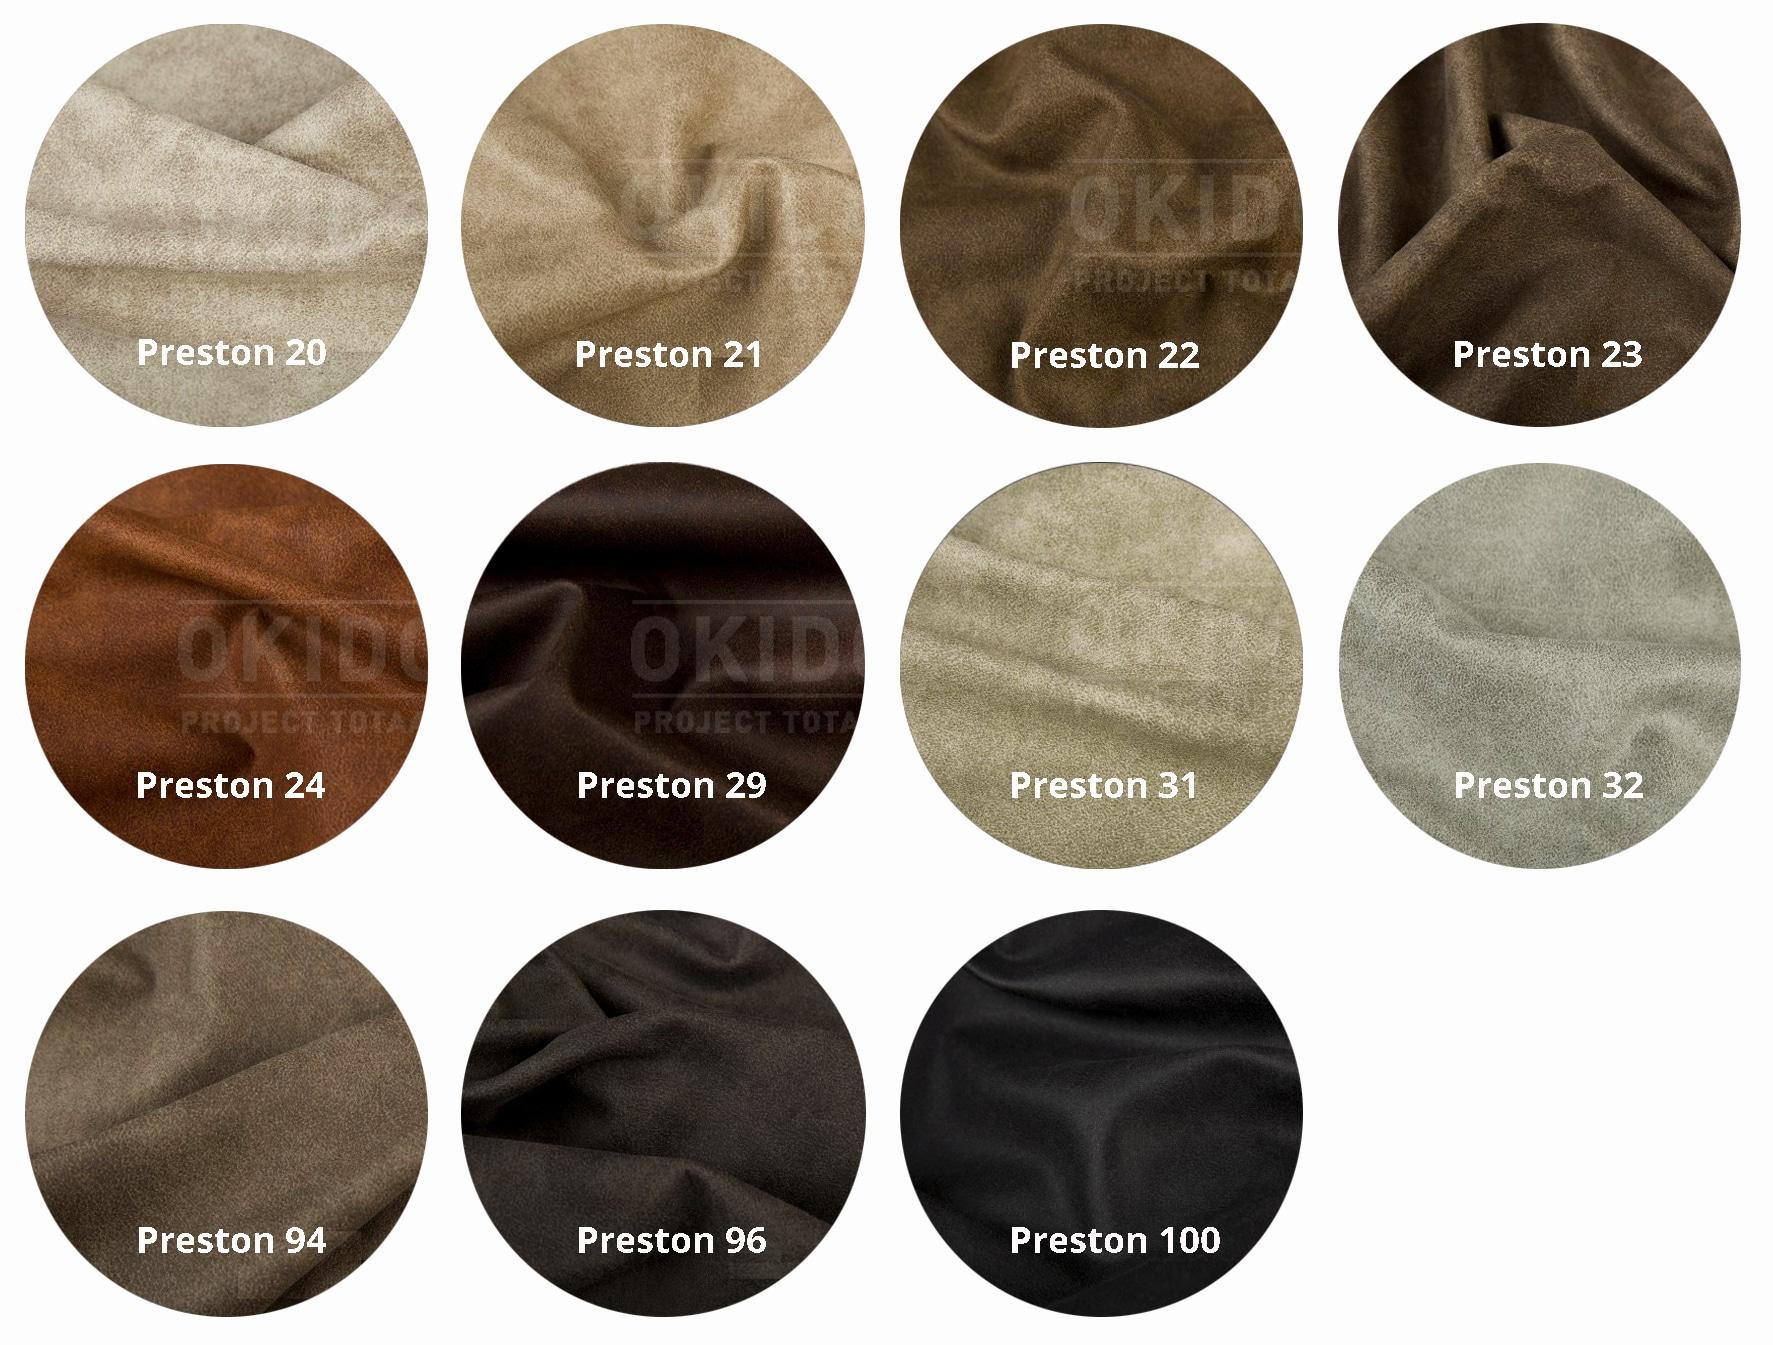 Preston kleurrondjes met logo 1 - Stoel Lisa Vintage